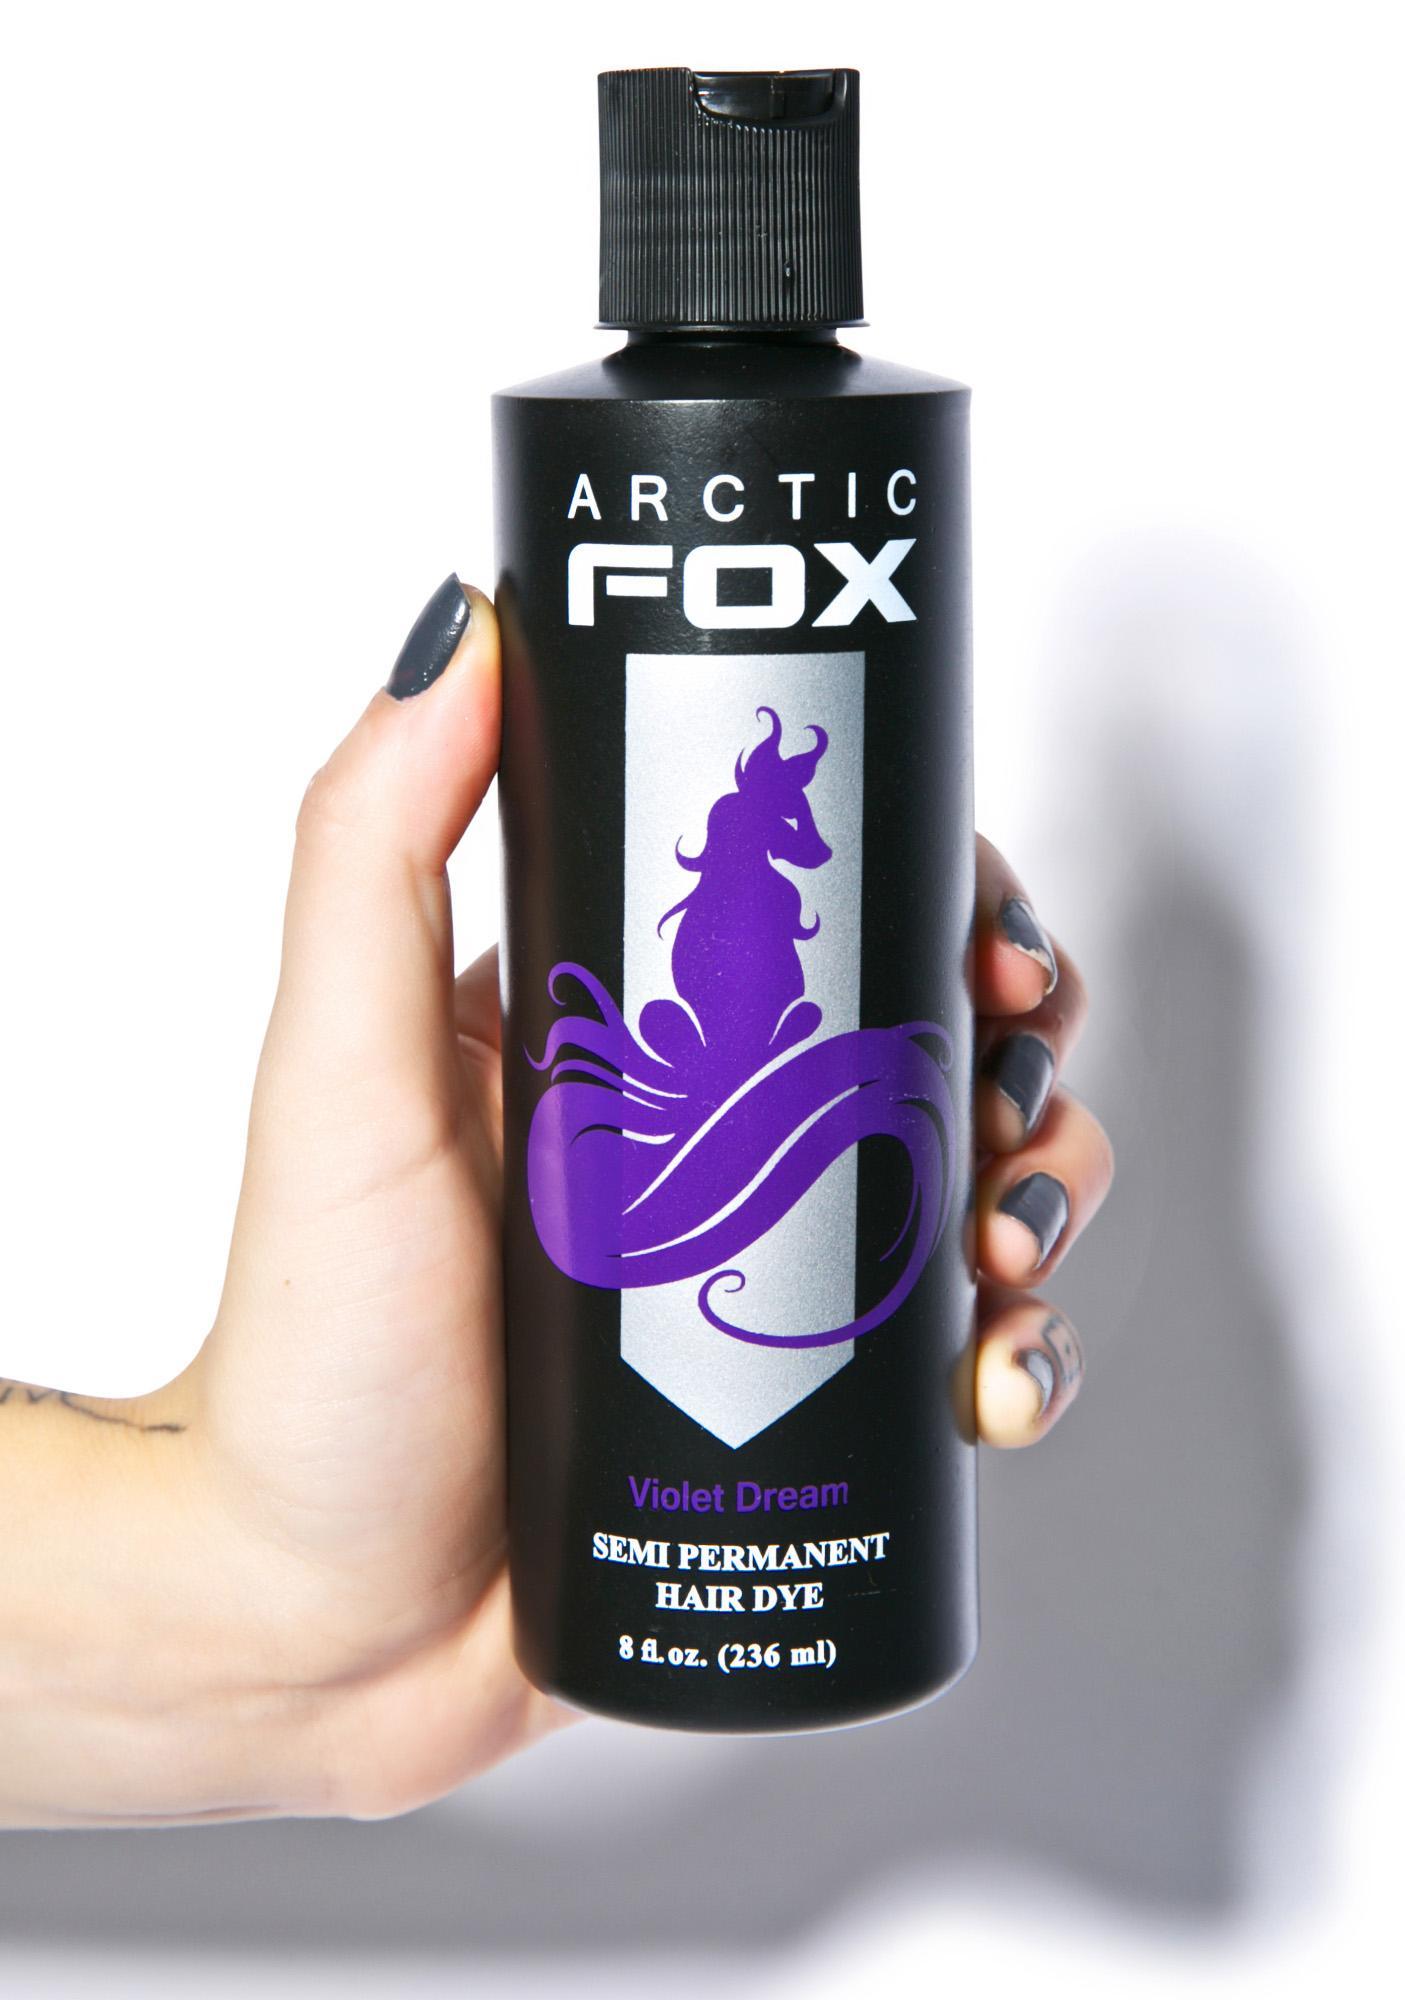 Arctic Fox Violet Dream Hair Dye